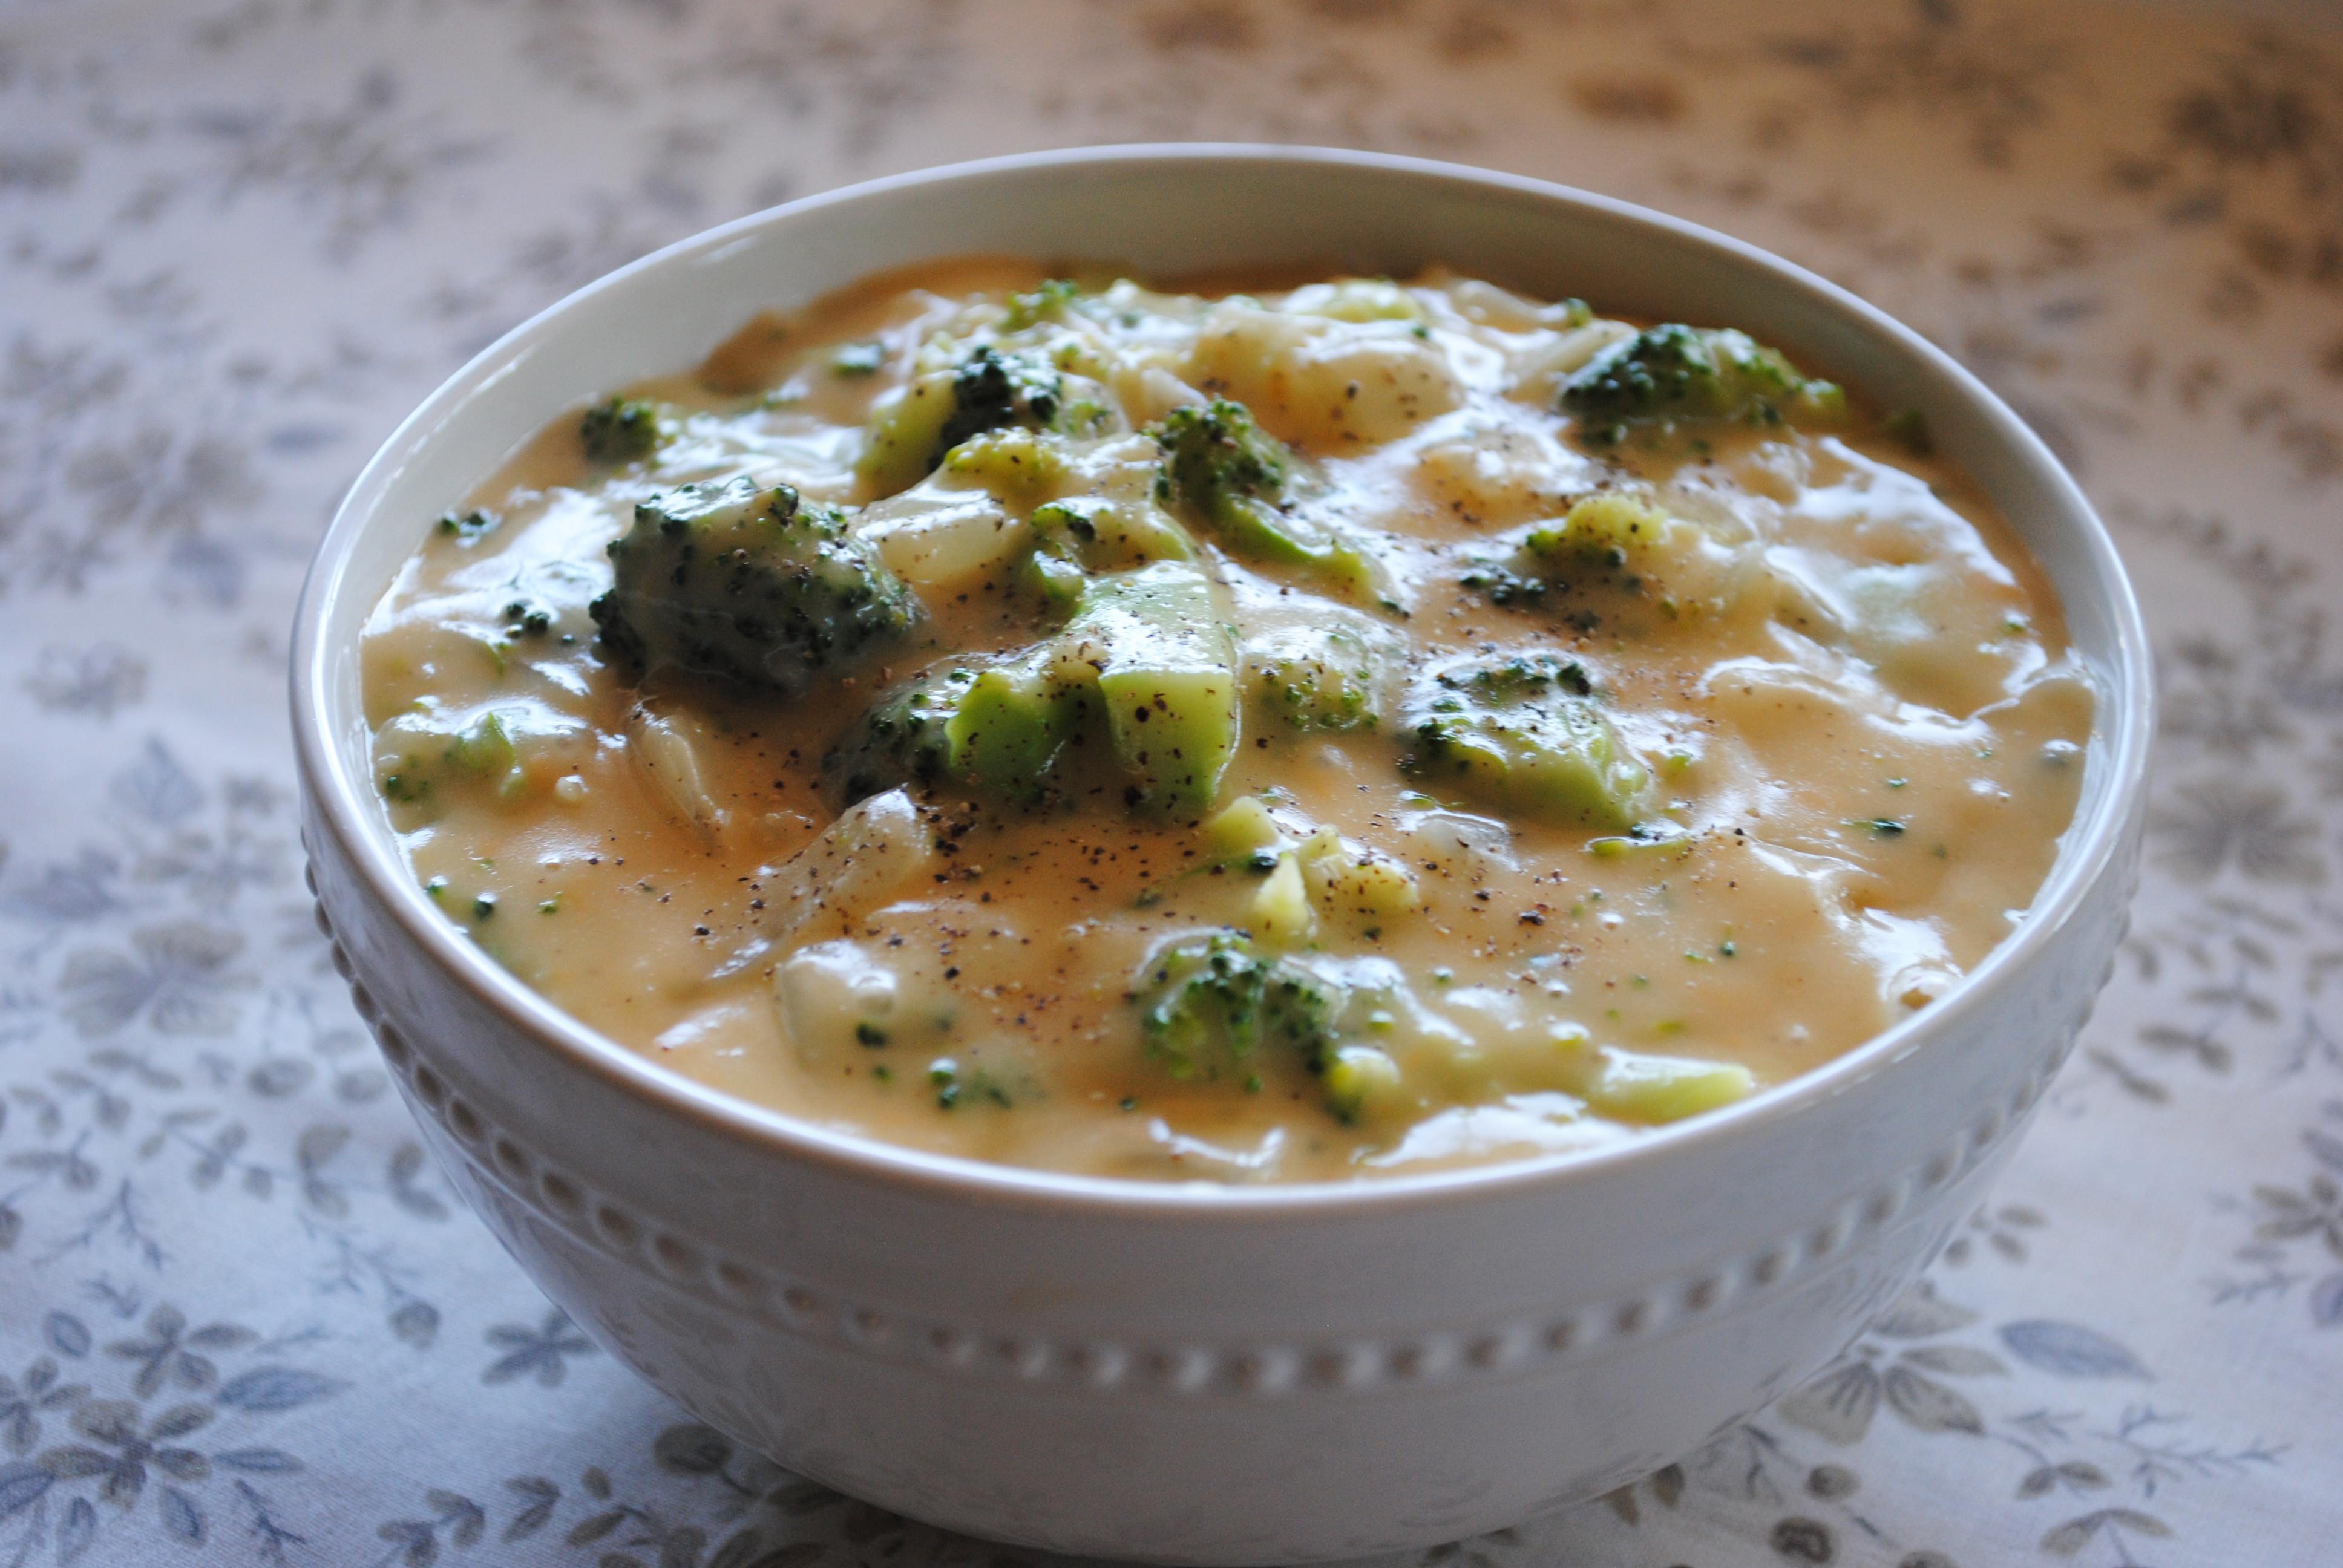 Vegan Broccoli Cheddar Soup  Creamy Broccoli Cheese Soup